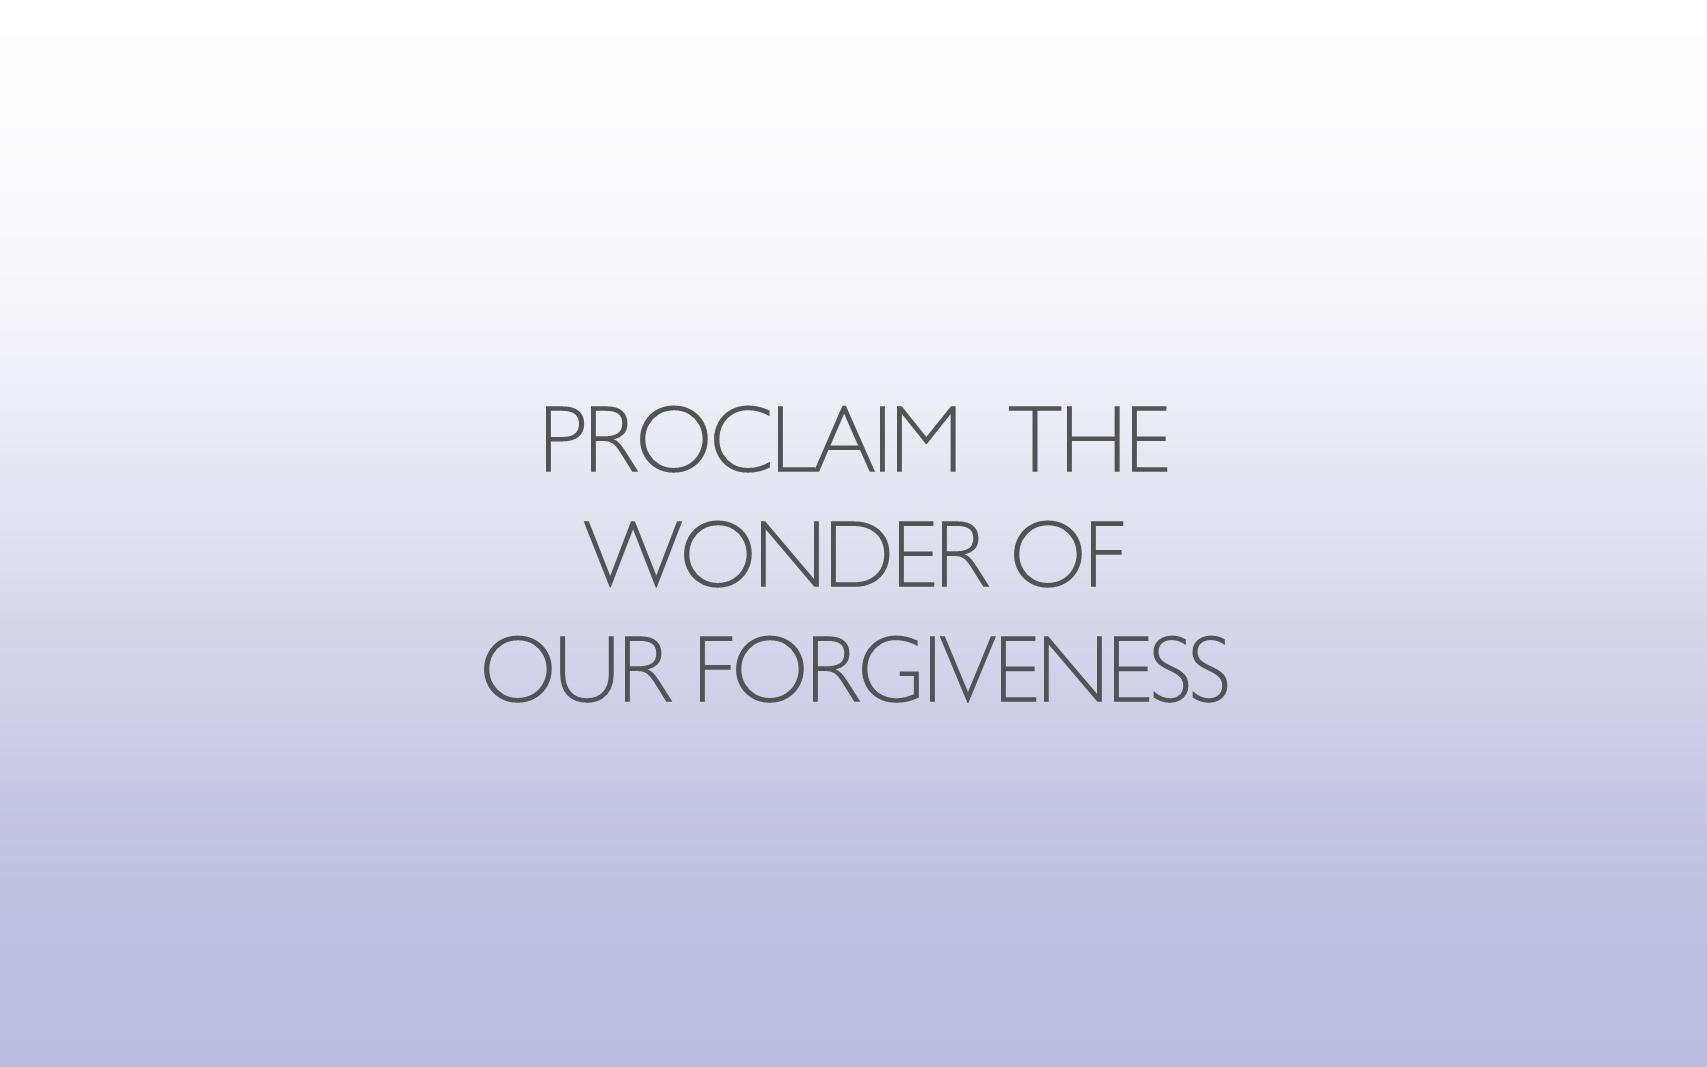 WCC-03 - Proclaiming Christ's Cross Regularly (8)